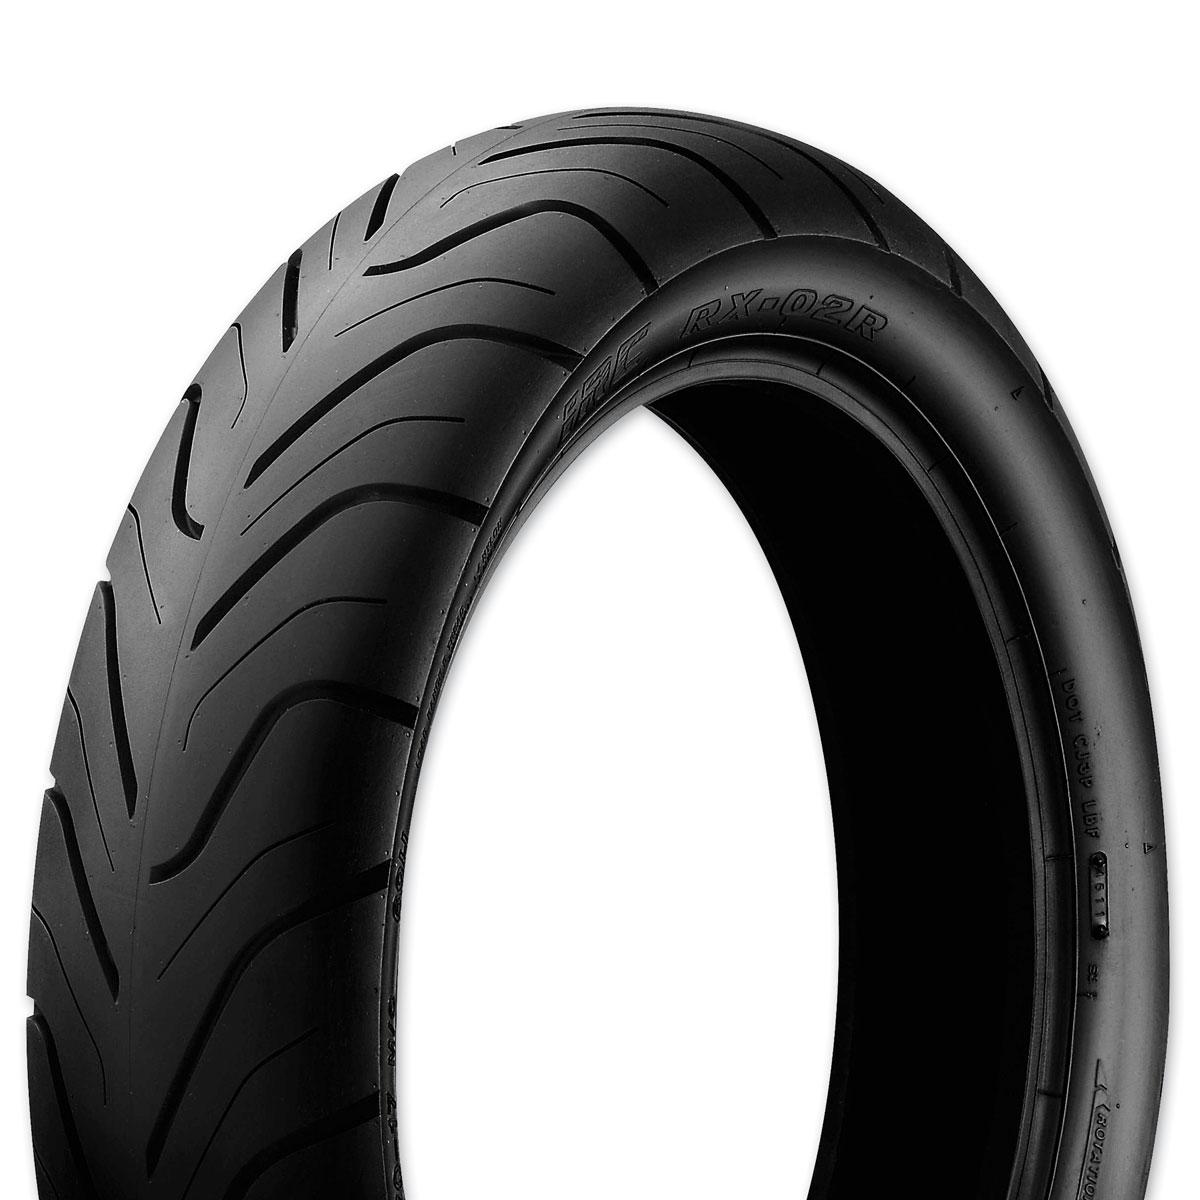 IRC RX-02 130/70-17 Rear Tire